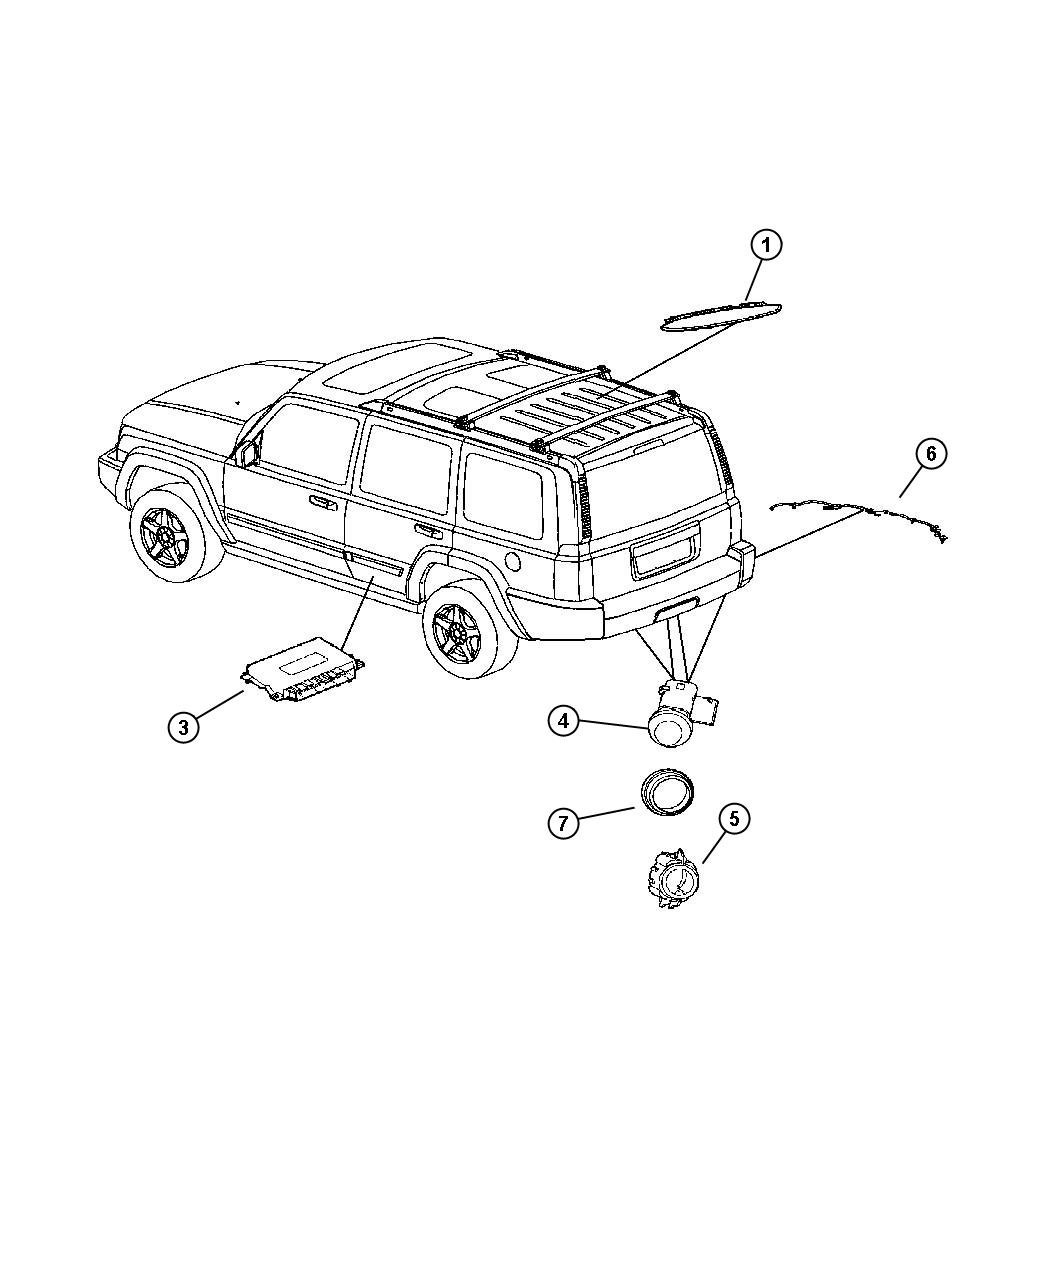 2007 2015 jeep oem parts diagram  2007  free engine image